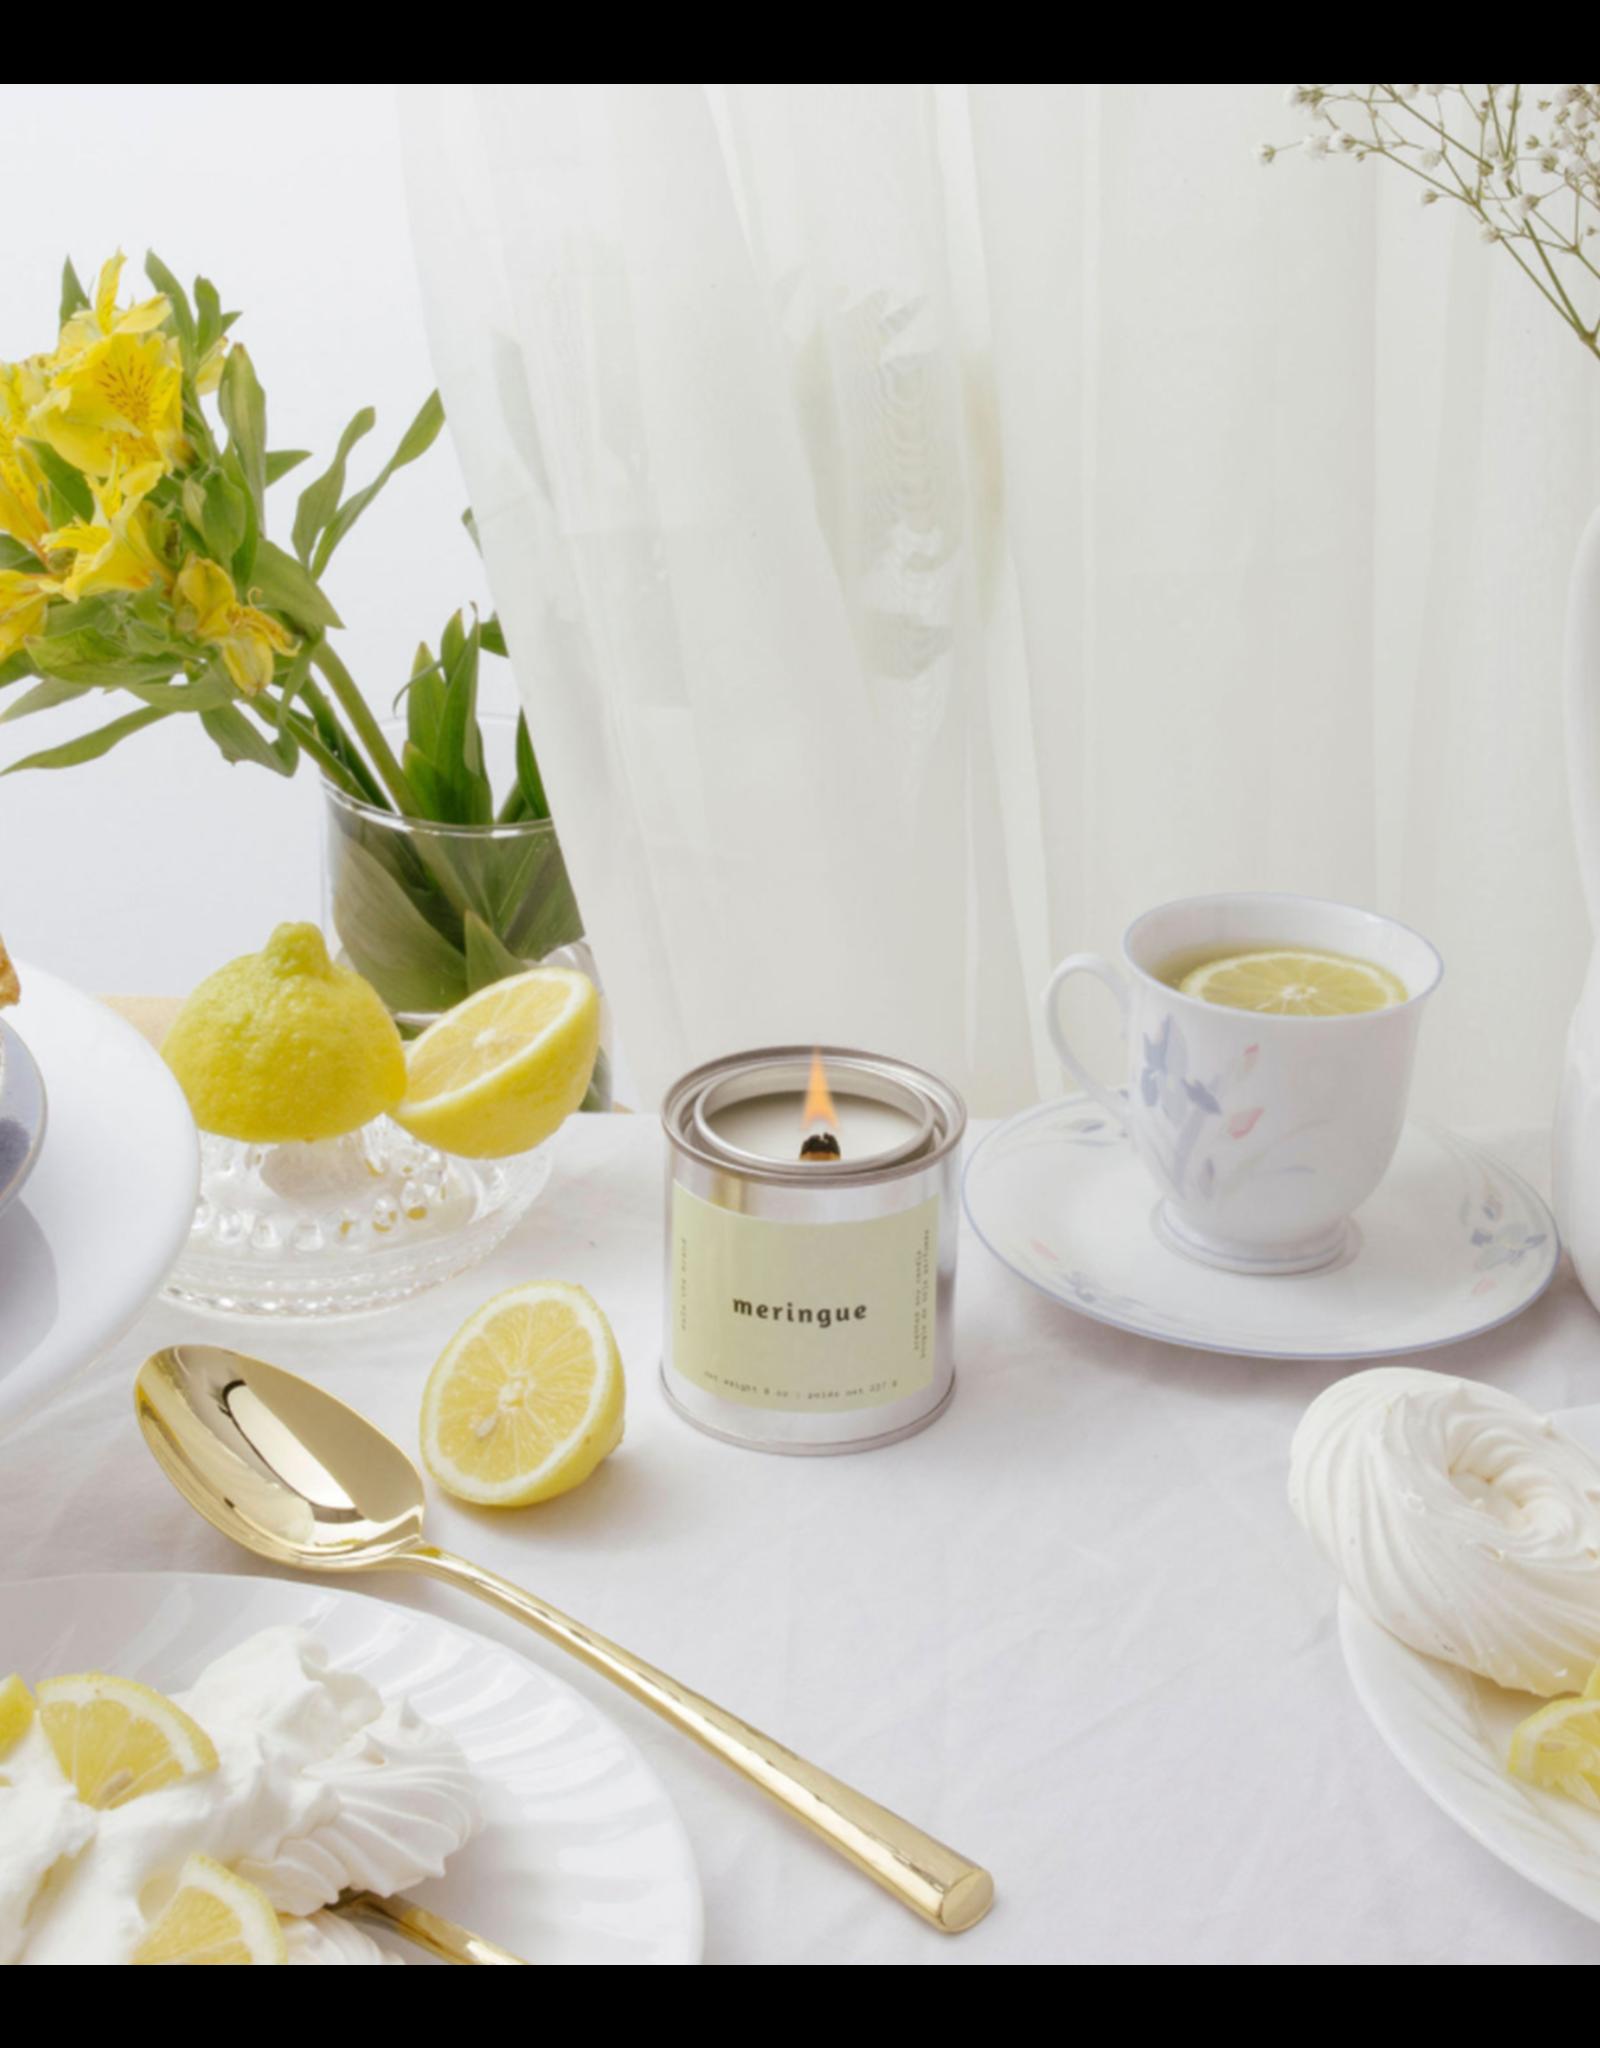 Mala The Brand Meringue Candle / Lemon + Butter + Vanilla